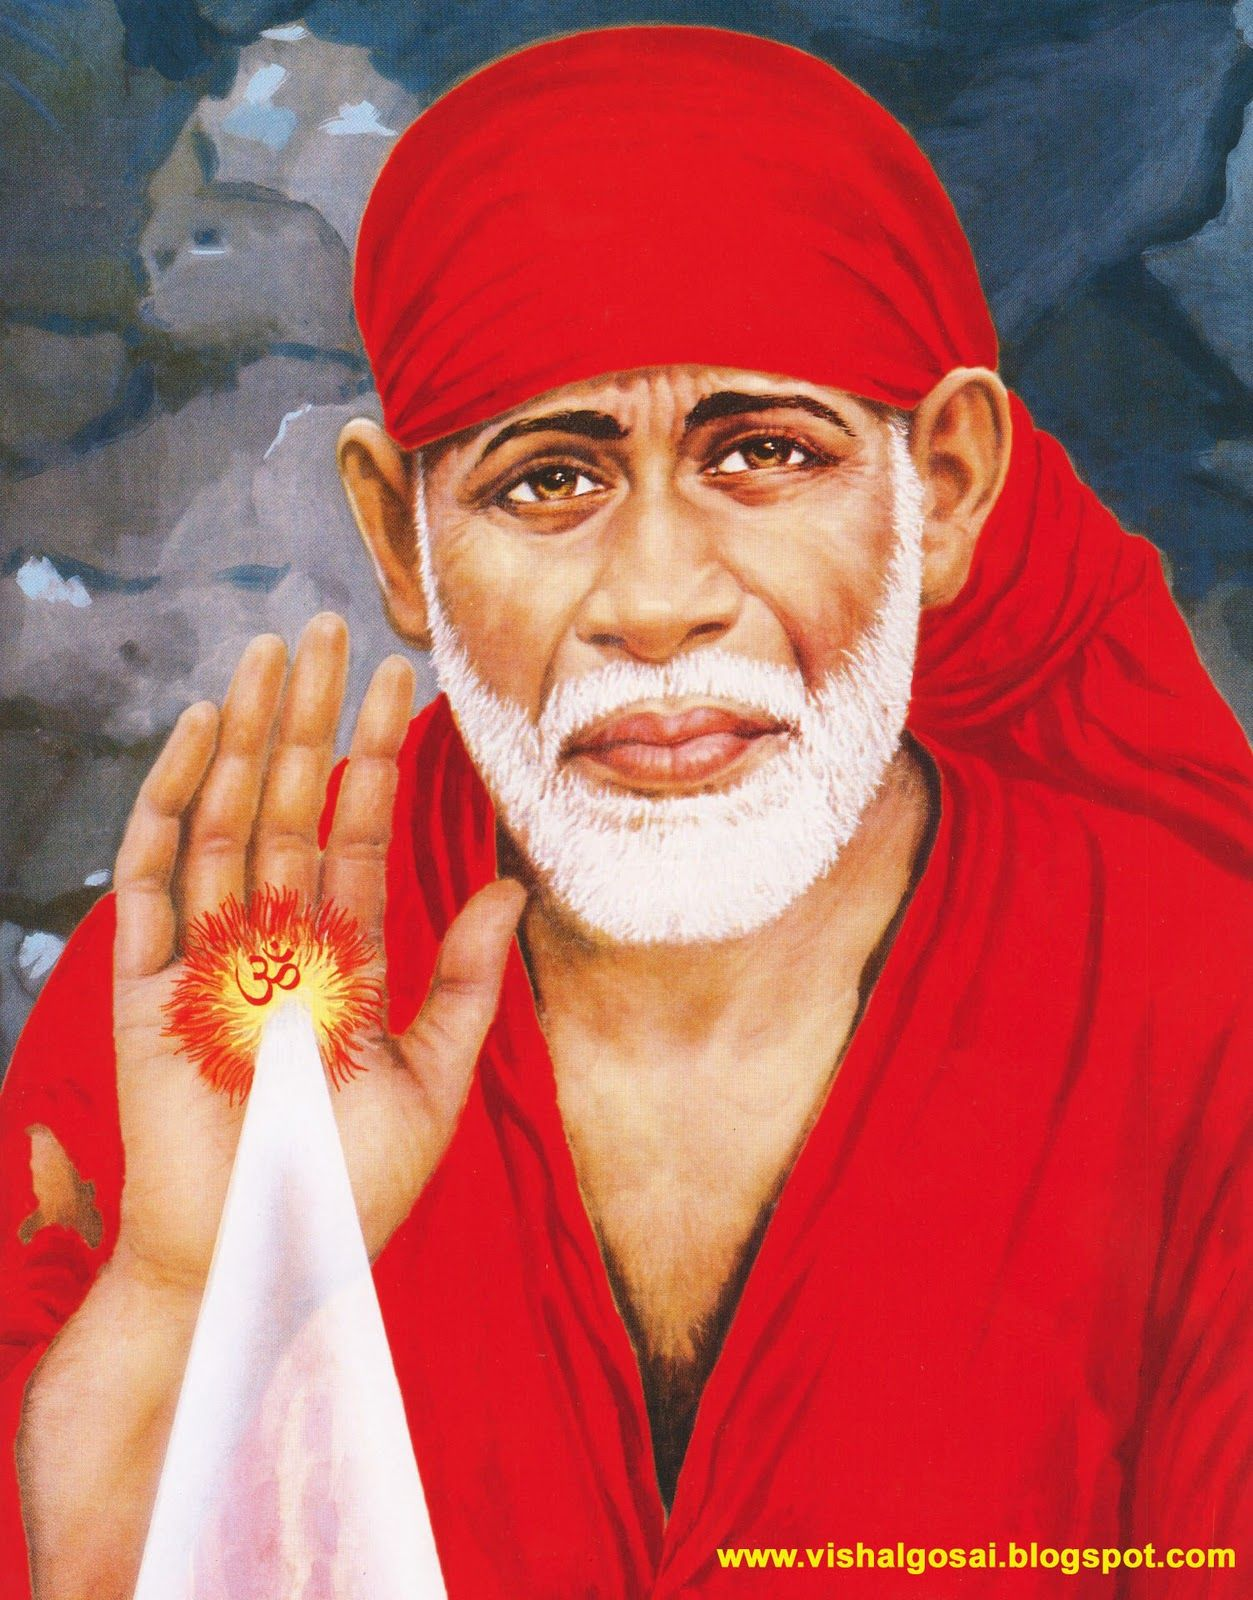 Om Sai Ram x A Couple of Sai Baba Experiences - Part 1307 ...